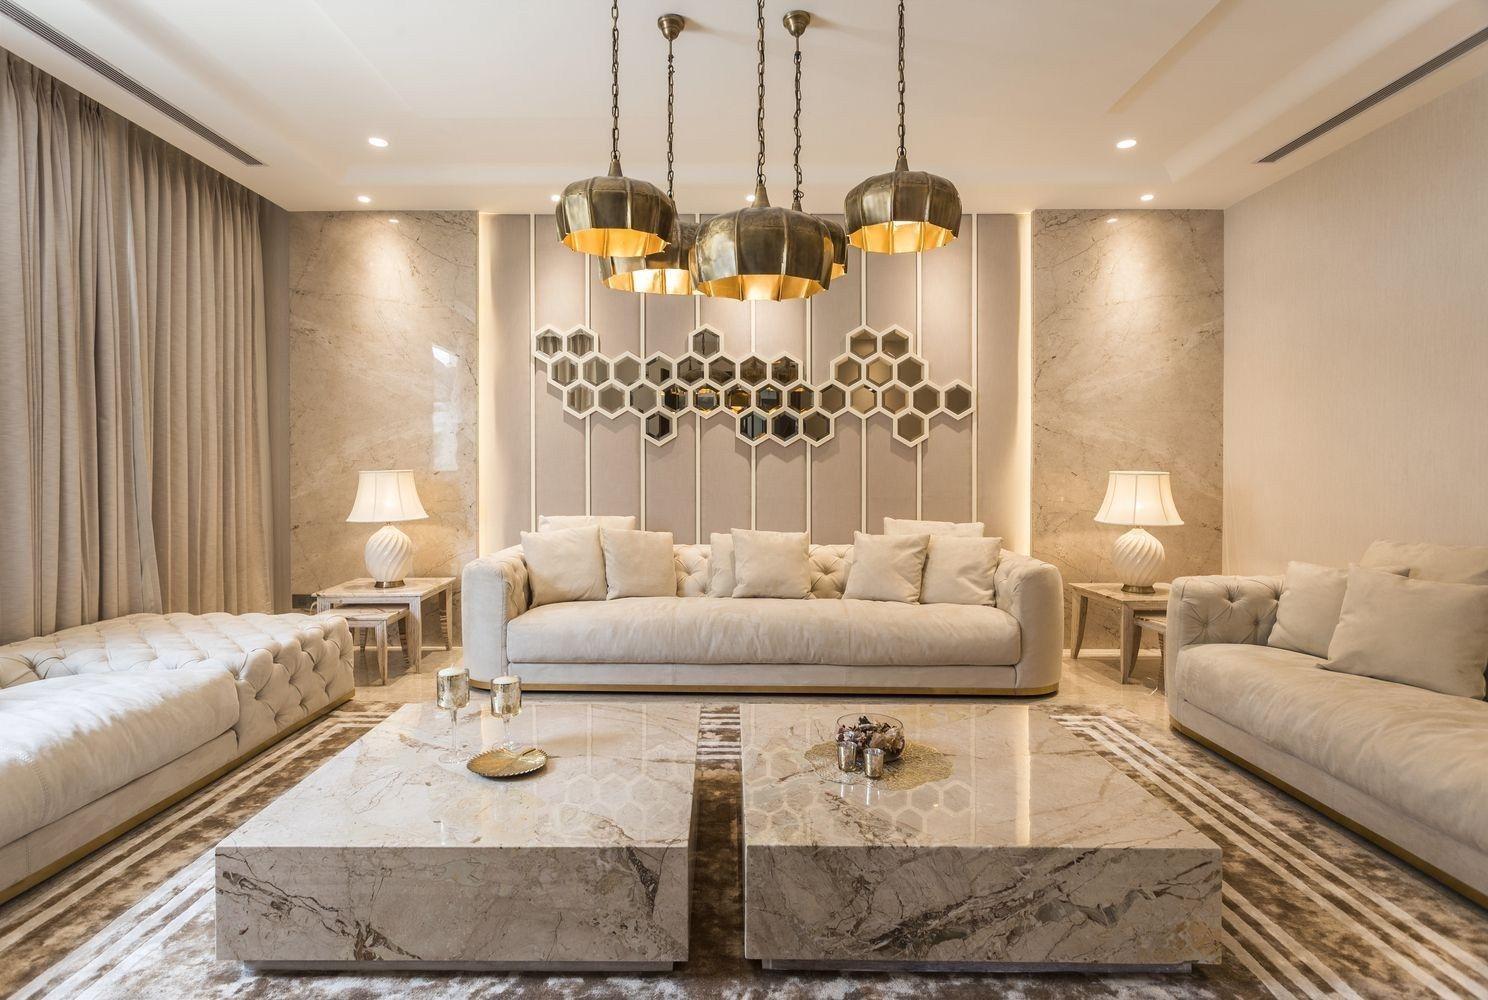 Gorgeous Apartment Ceiling Design Ideas That Inspiring 38 ...